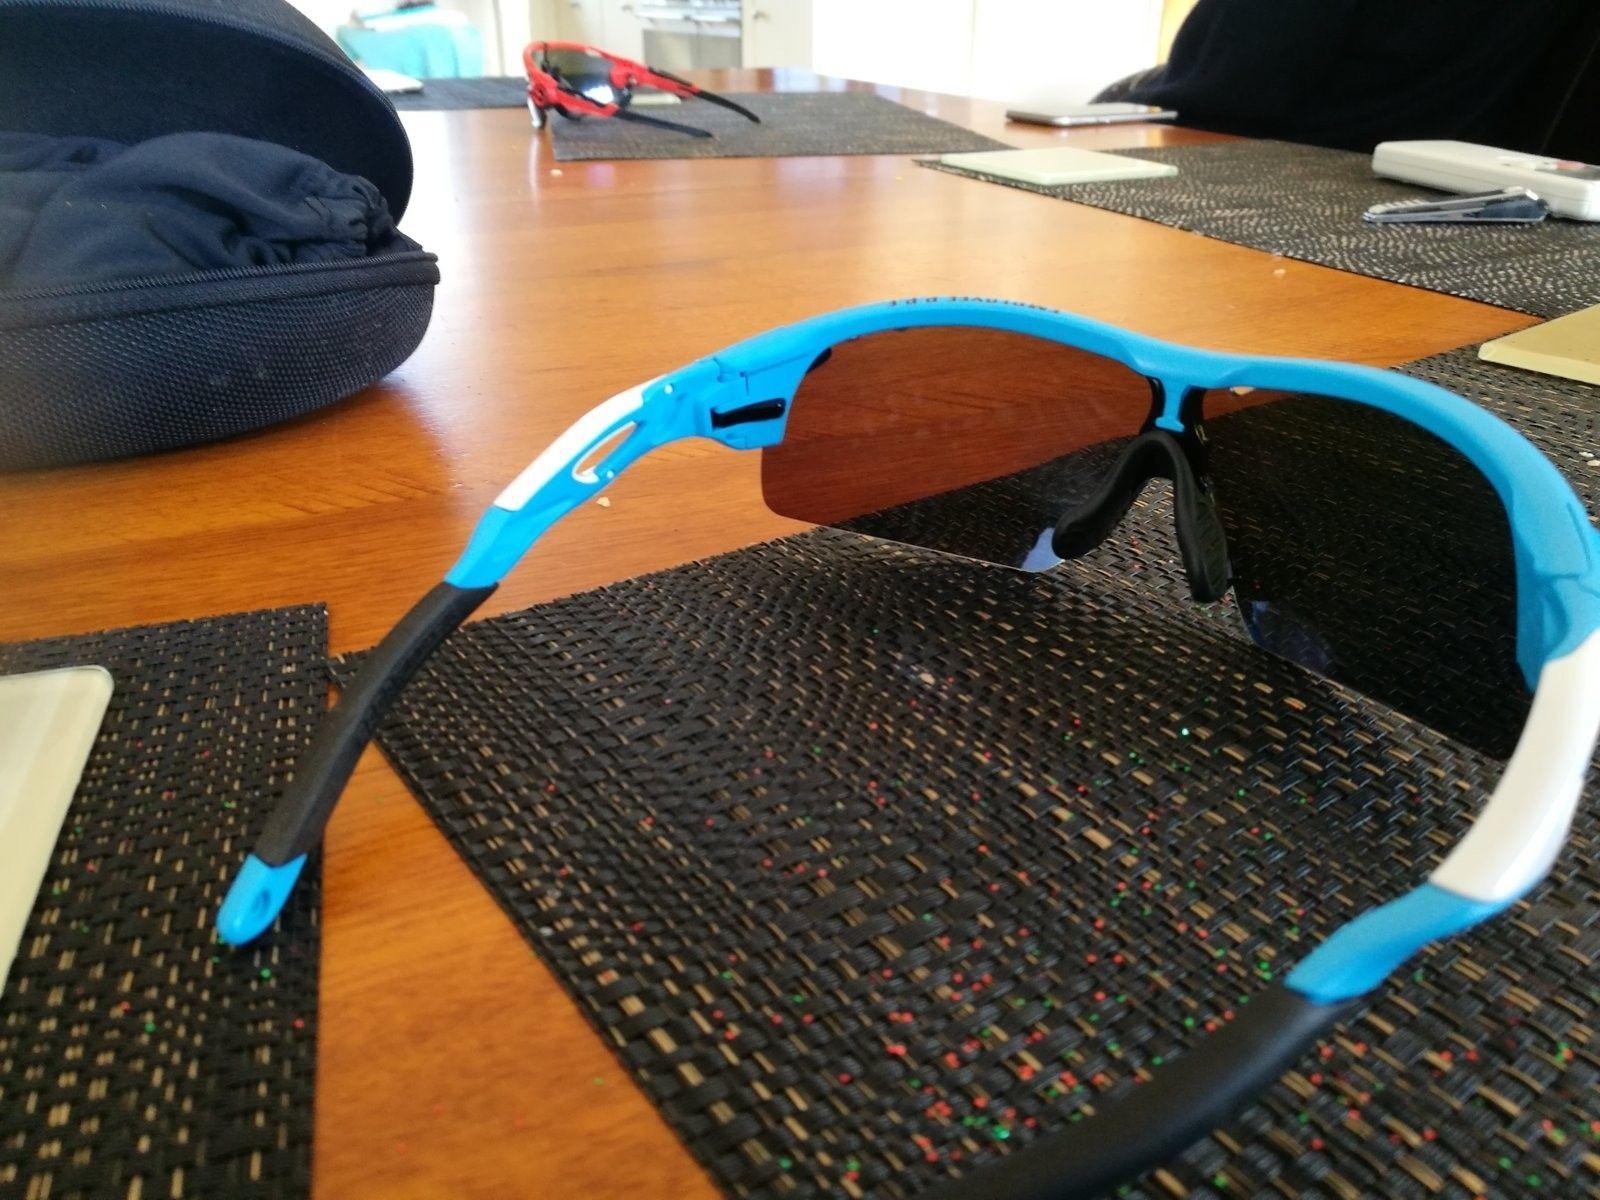 Radarlock XL Glacier blue help!: Not sure if Authentic or not - IMG_20160720_141507.jpg